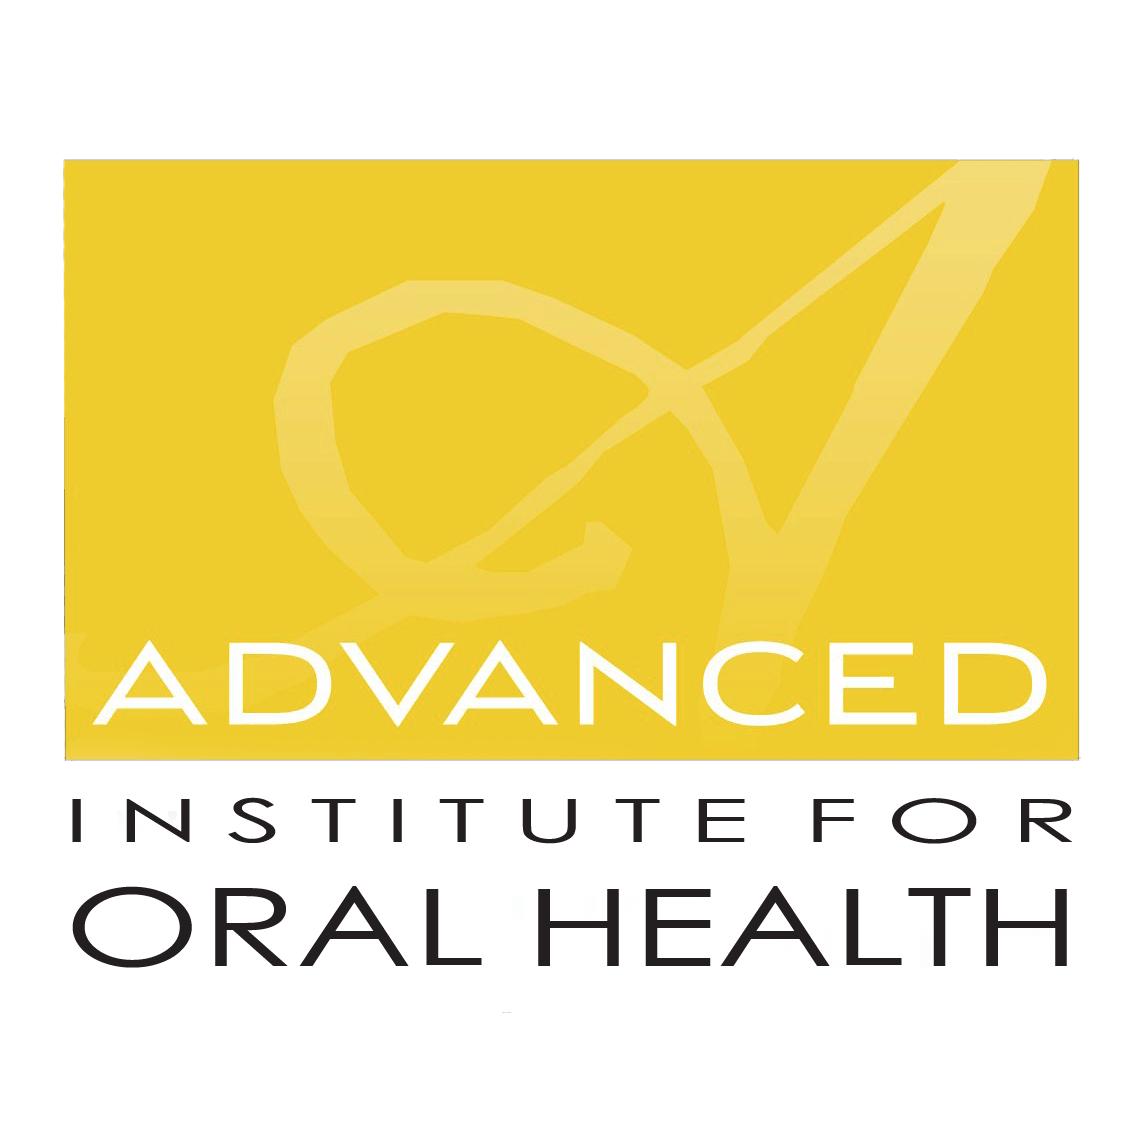 Advanced Institute for Oral Health - Grantwood, TN 37027 - (615)208-4234 | ShowMeLocal.com